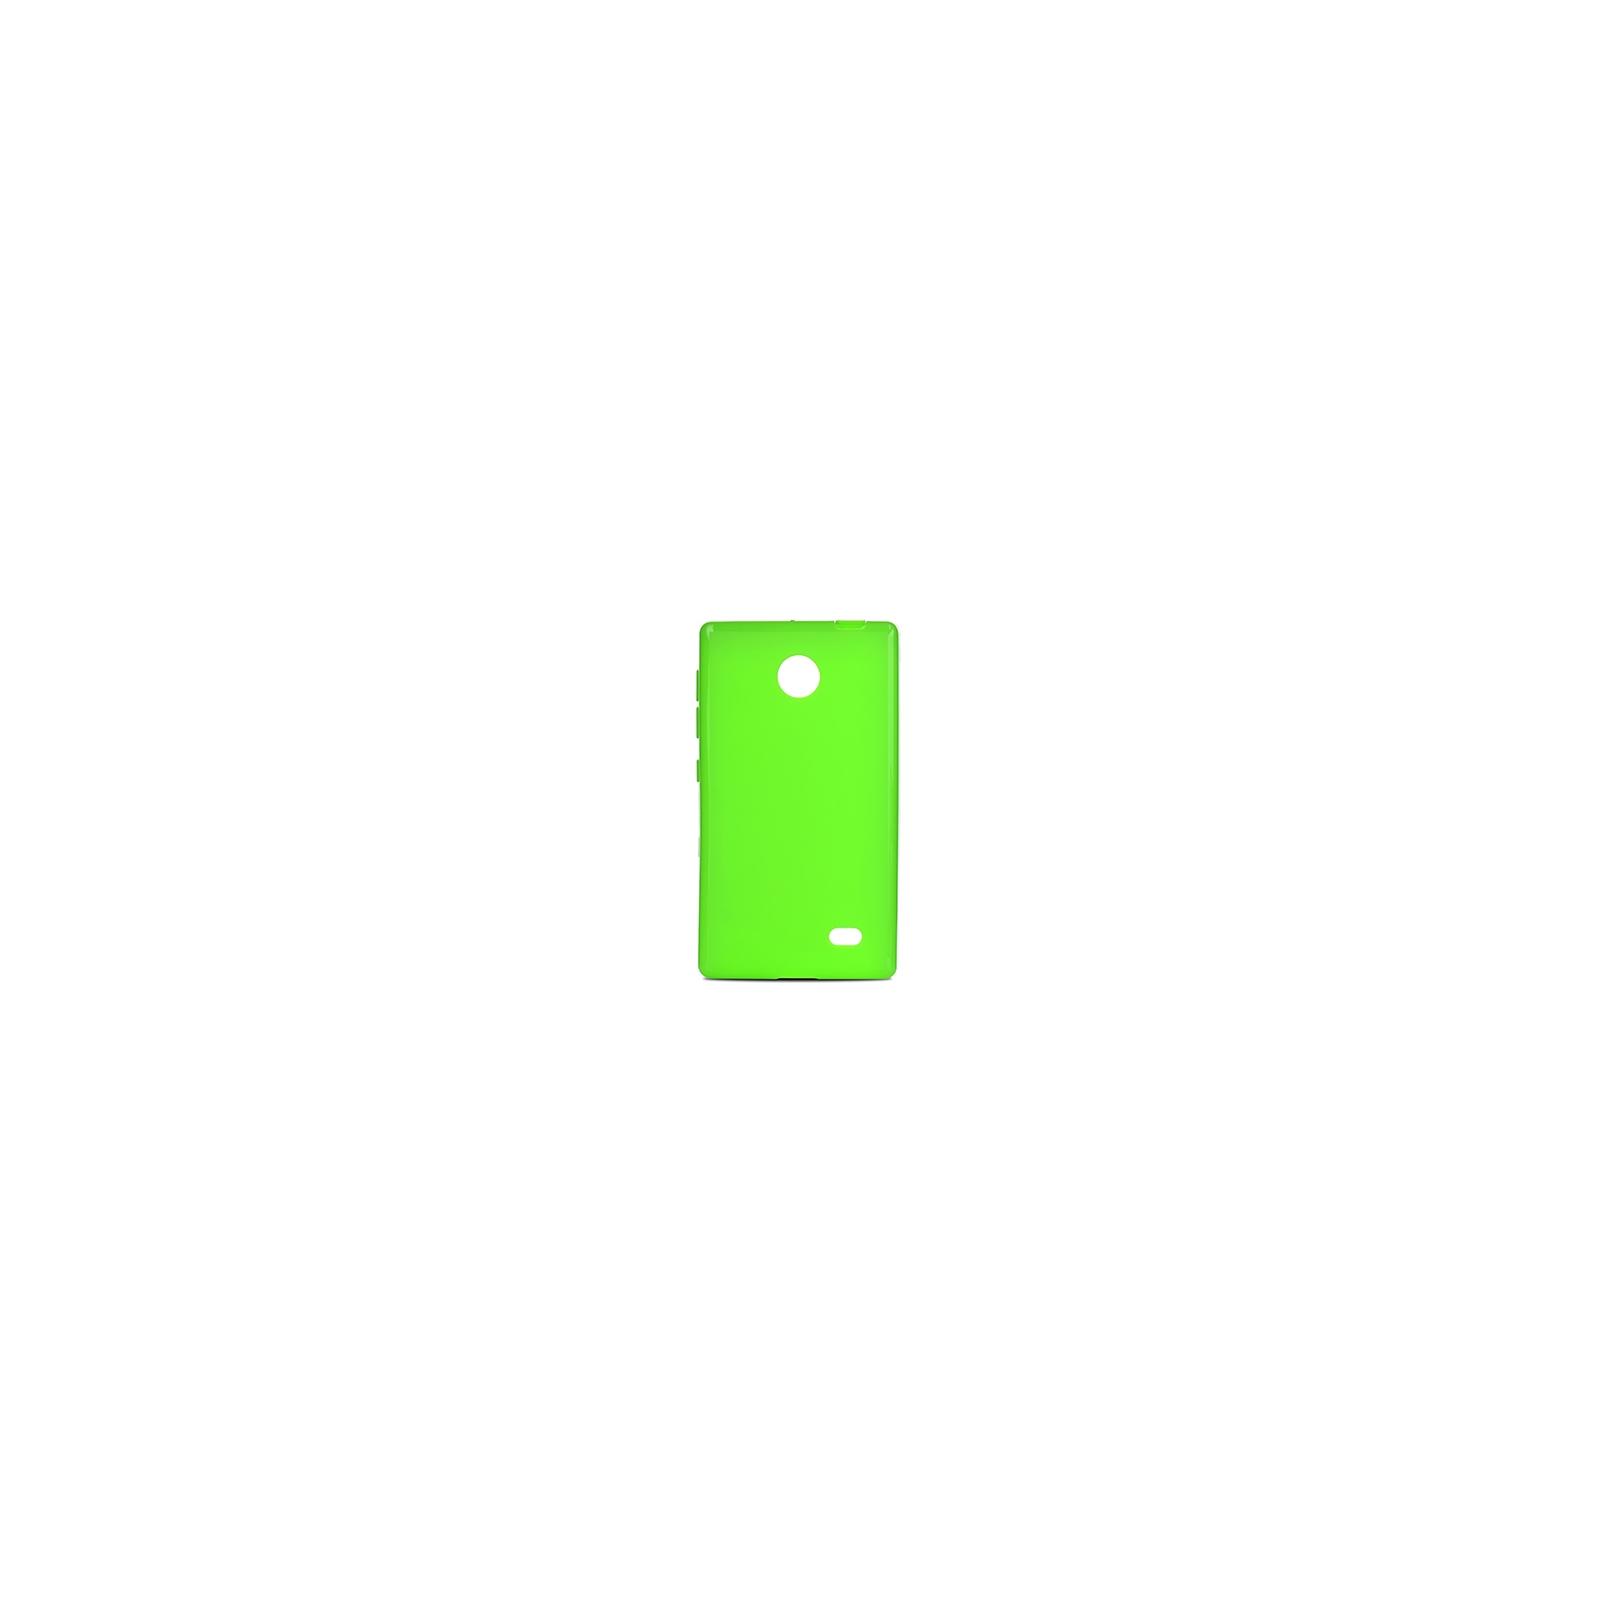 Чехол для моб. телефона Drobak для Nokia X/Elastic PU/Green (215117)